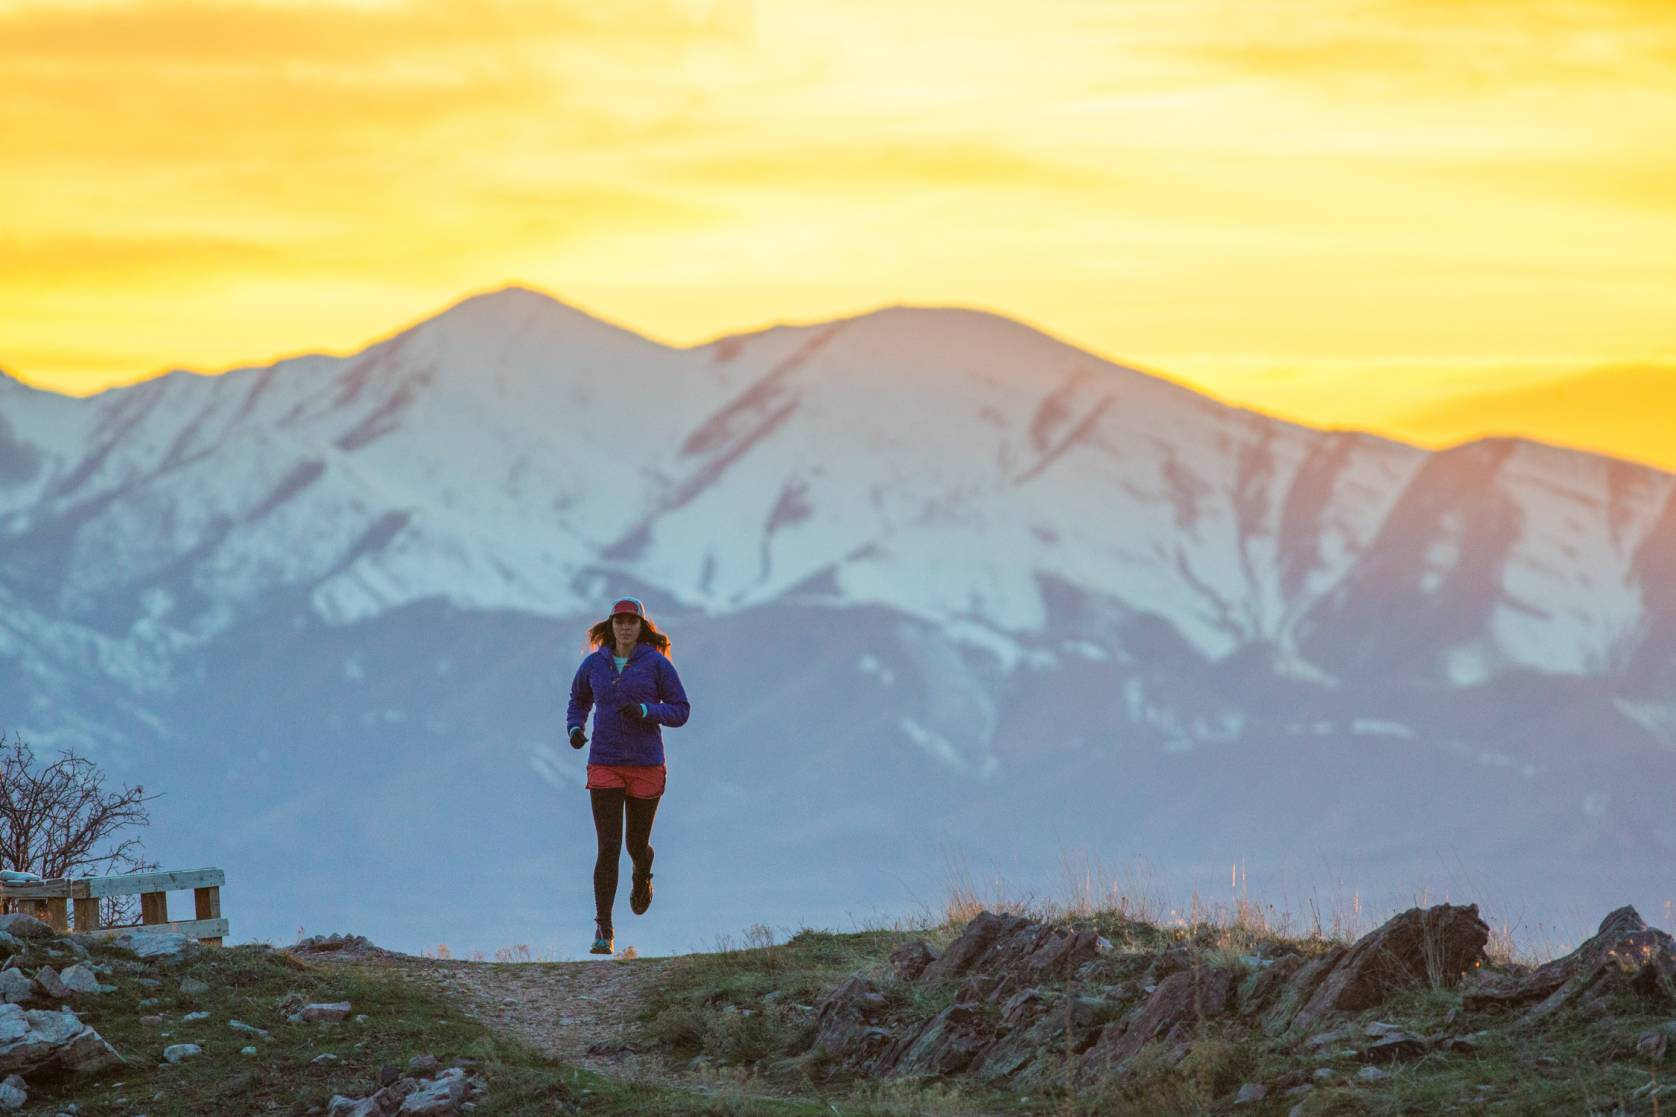 Trail Running in Mountains wearing Patagonia Micro Puff Jacket